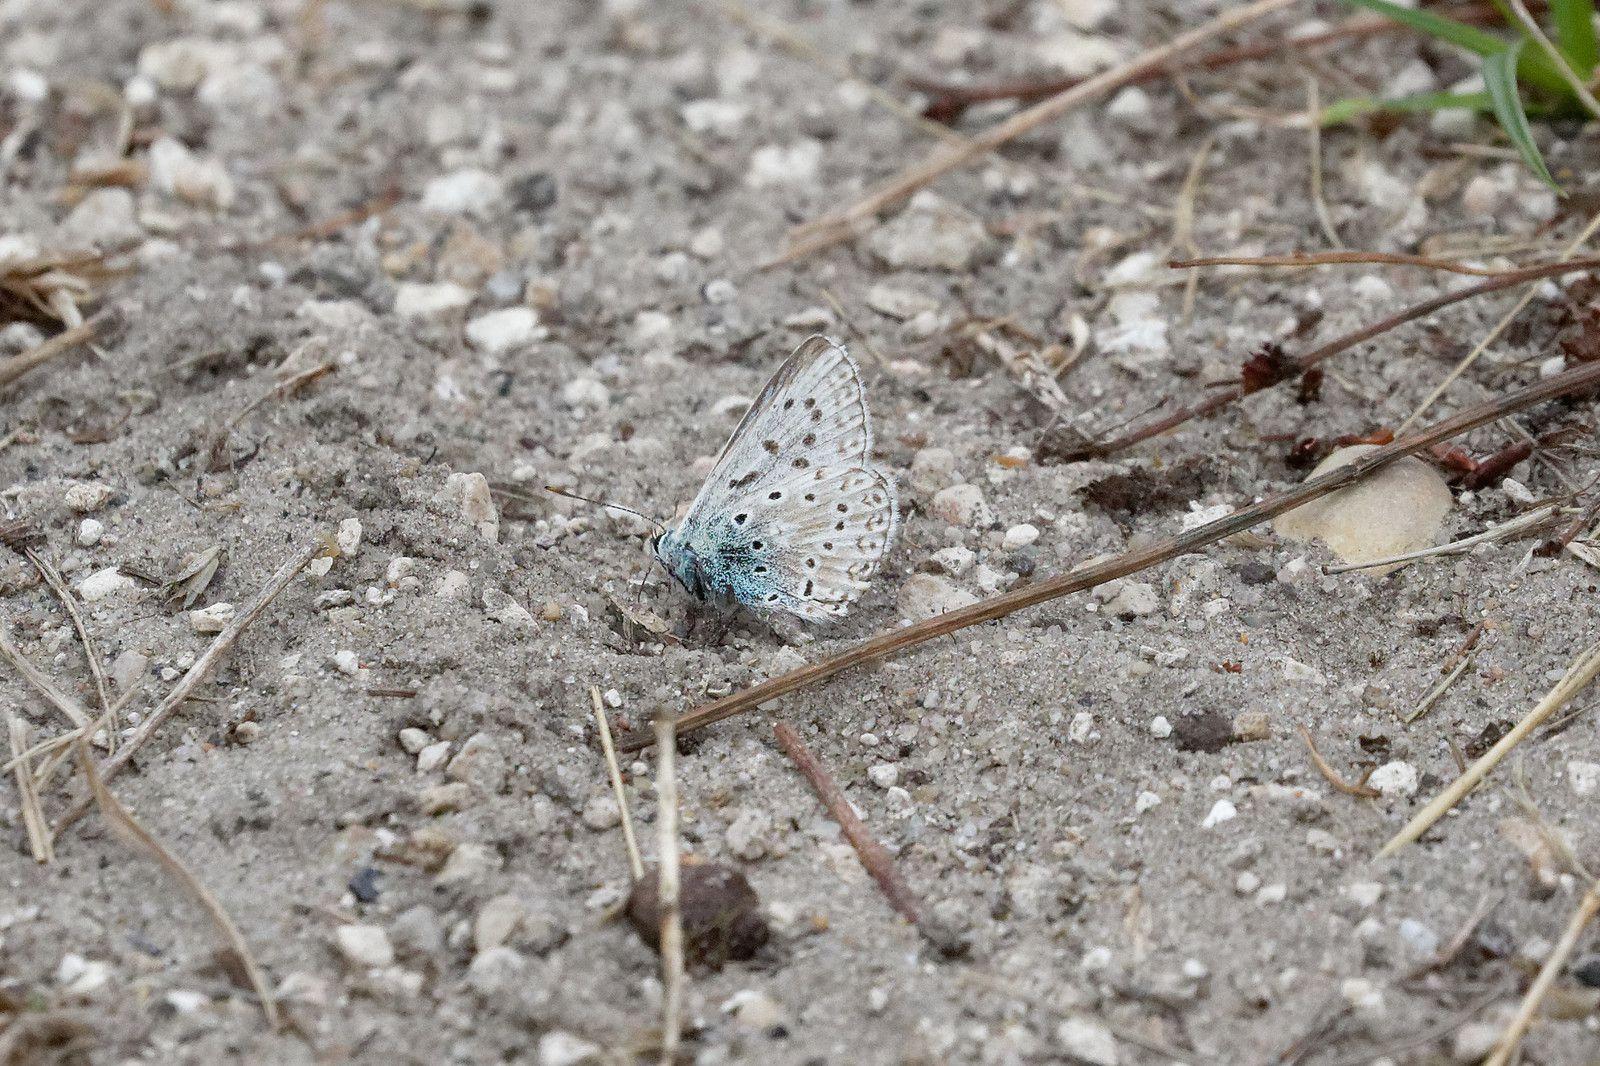 Bleu-nacré (Lysandra coridon)